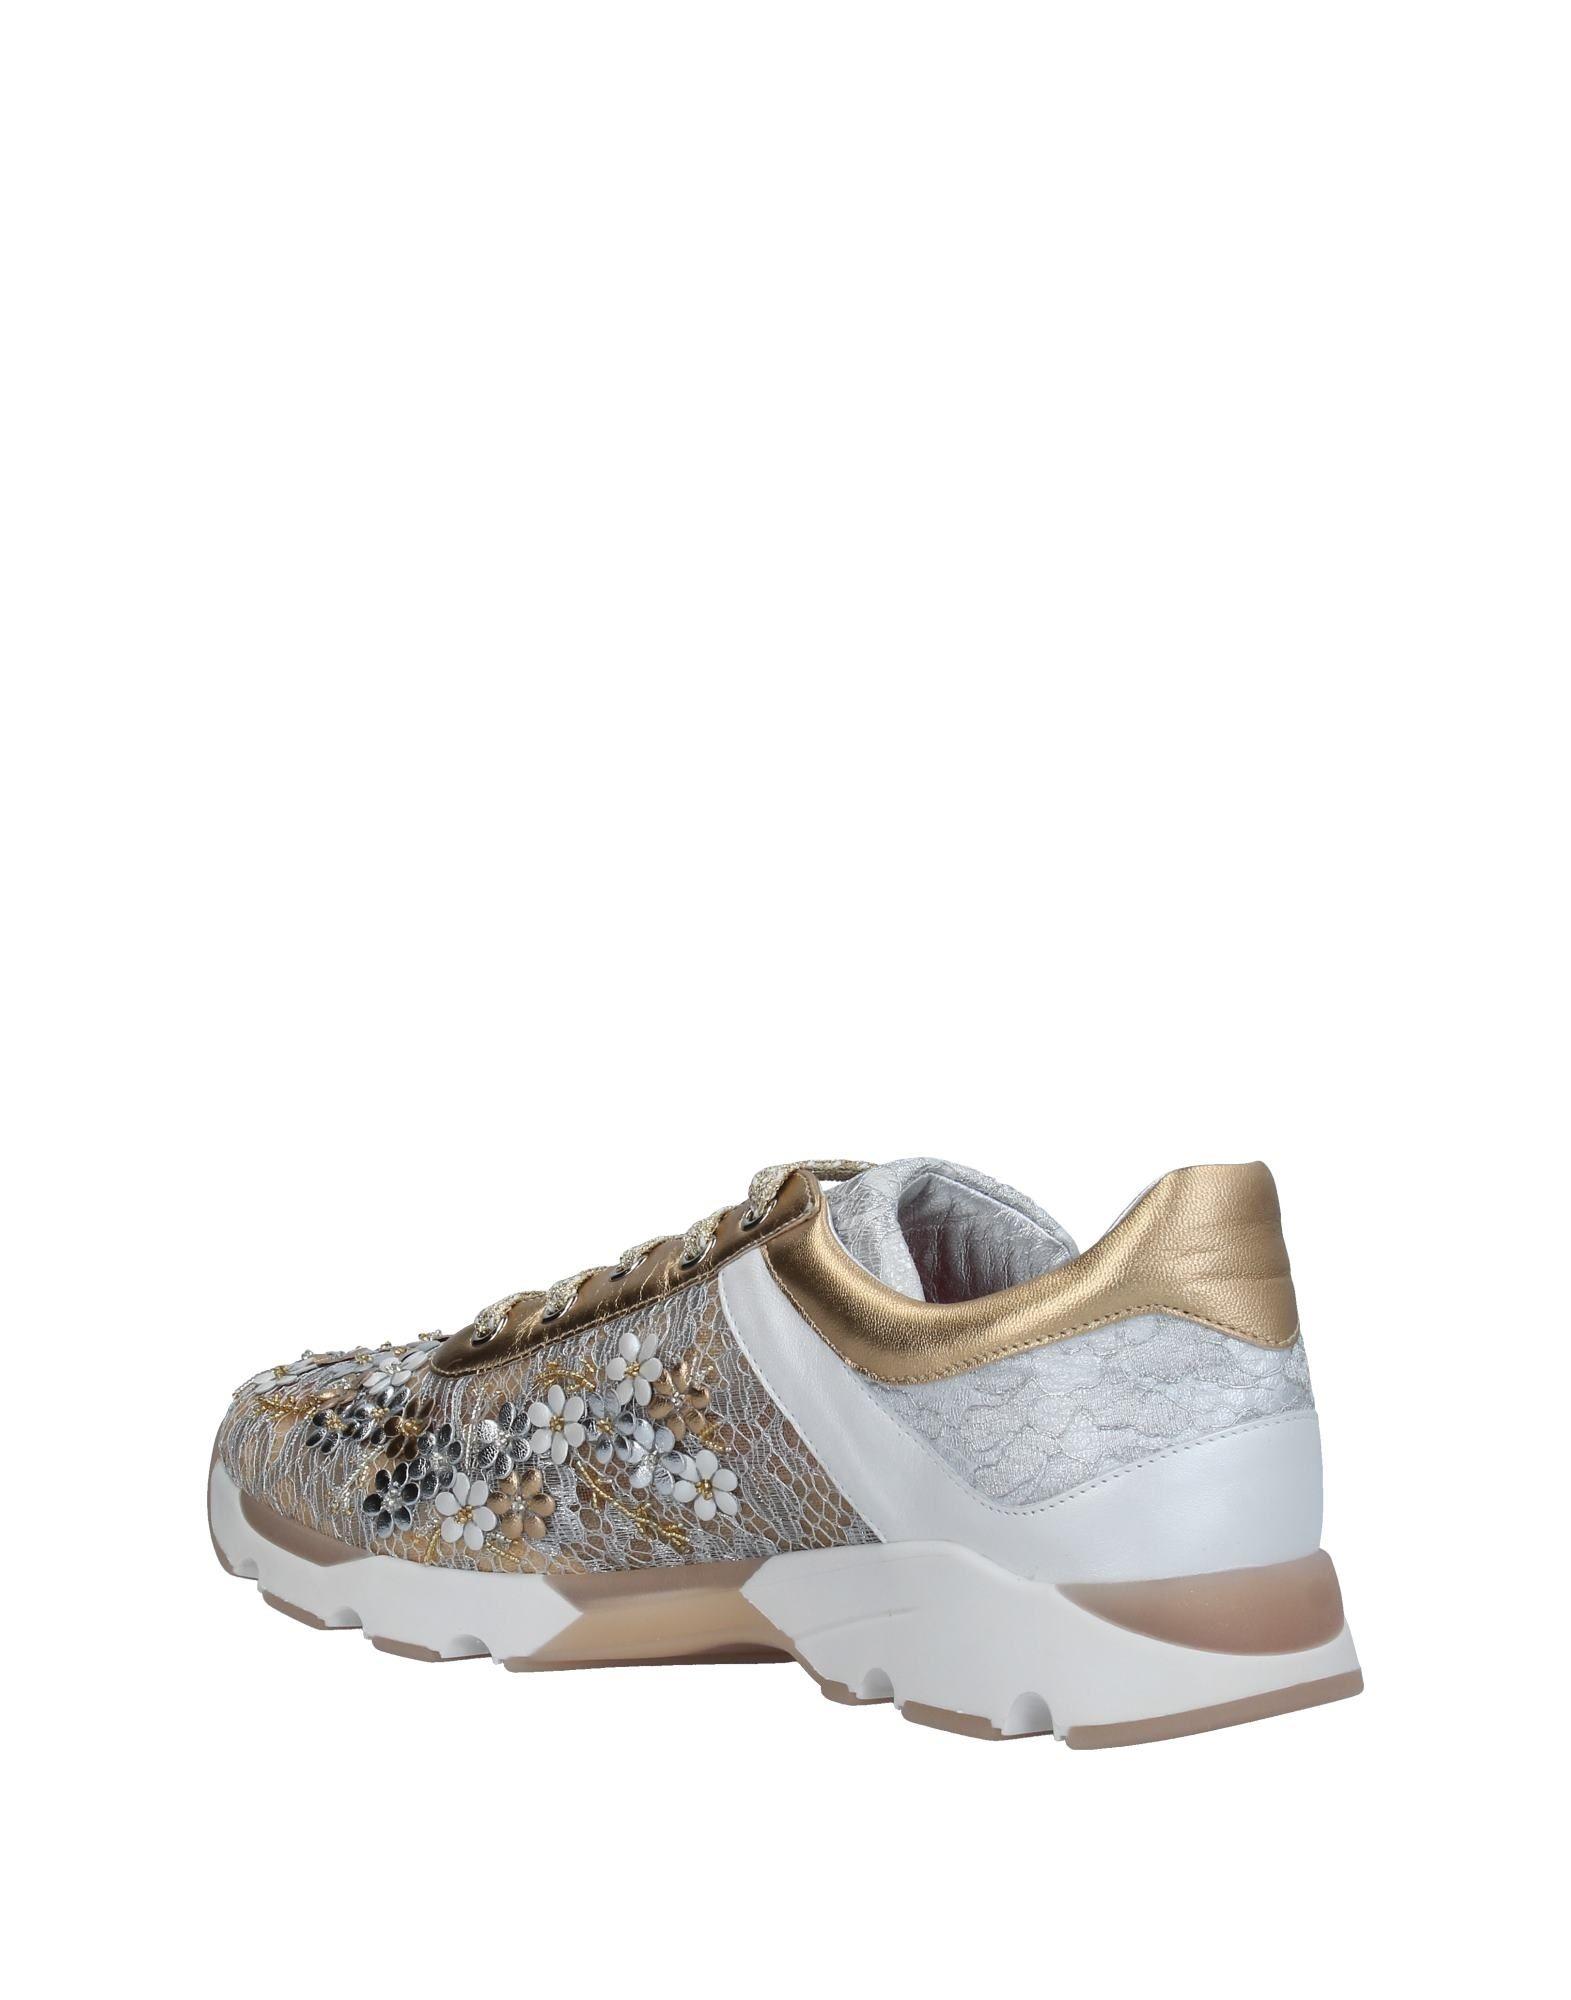 Rene' Caovilla Sneakers 11340194UT Damen  11340194UT Sneakers Neue Schuhe 6f70b0